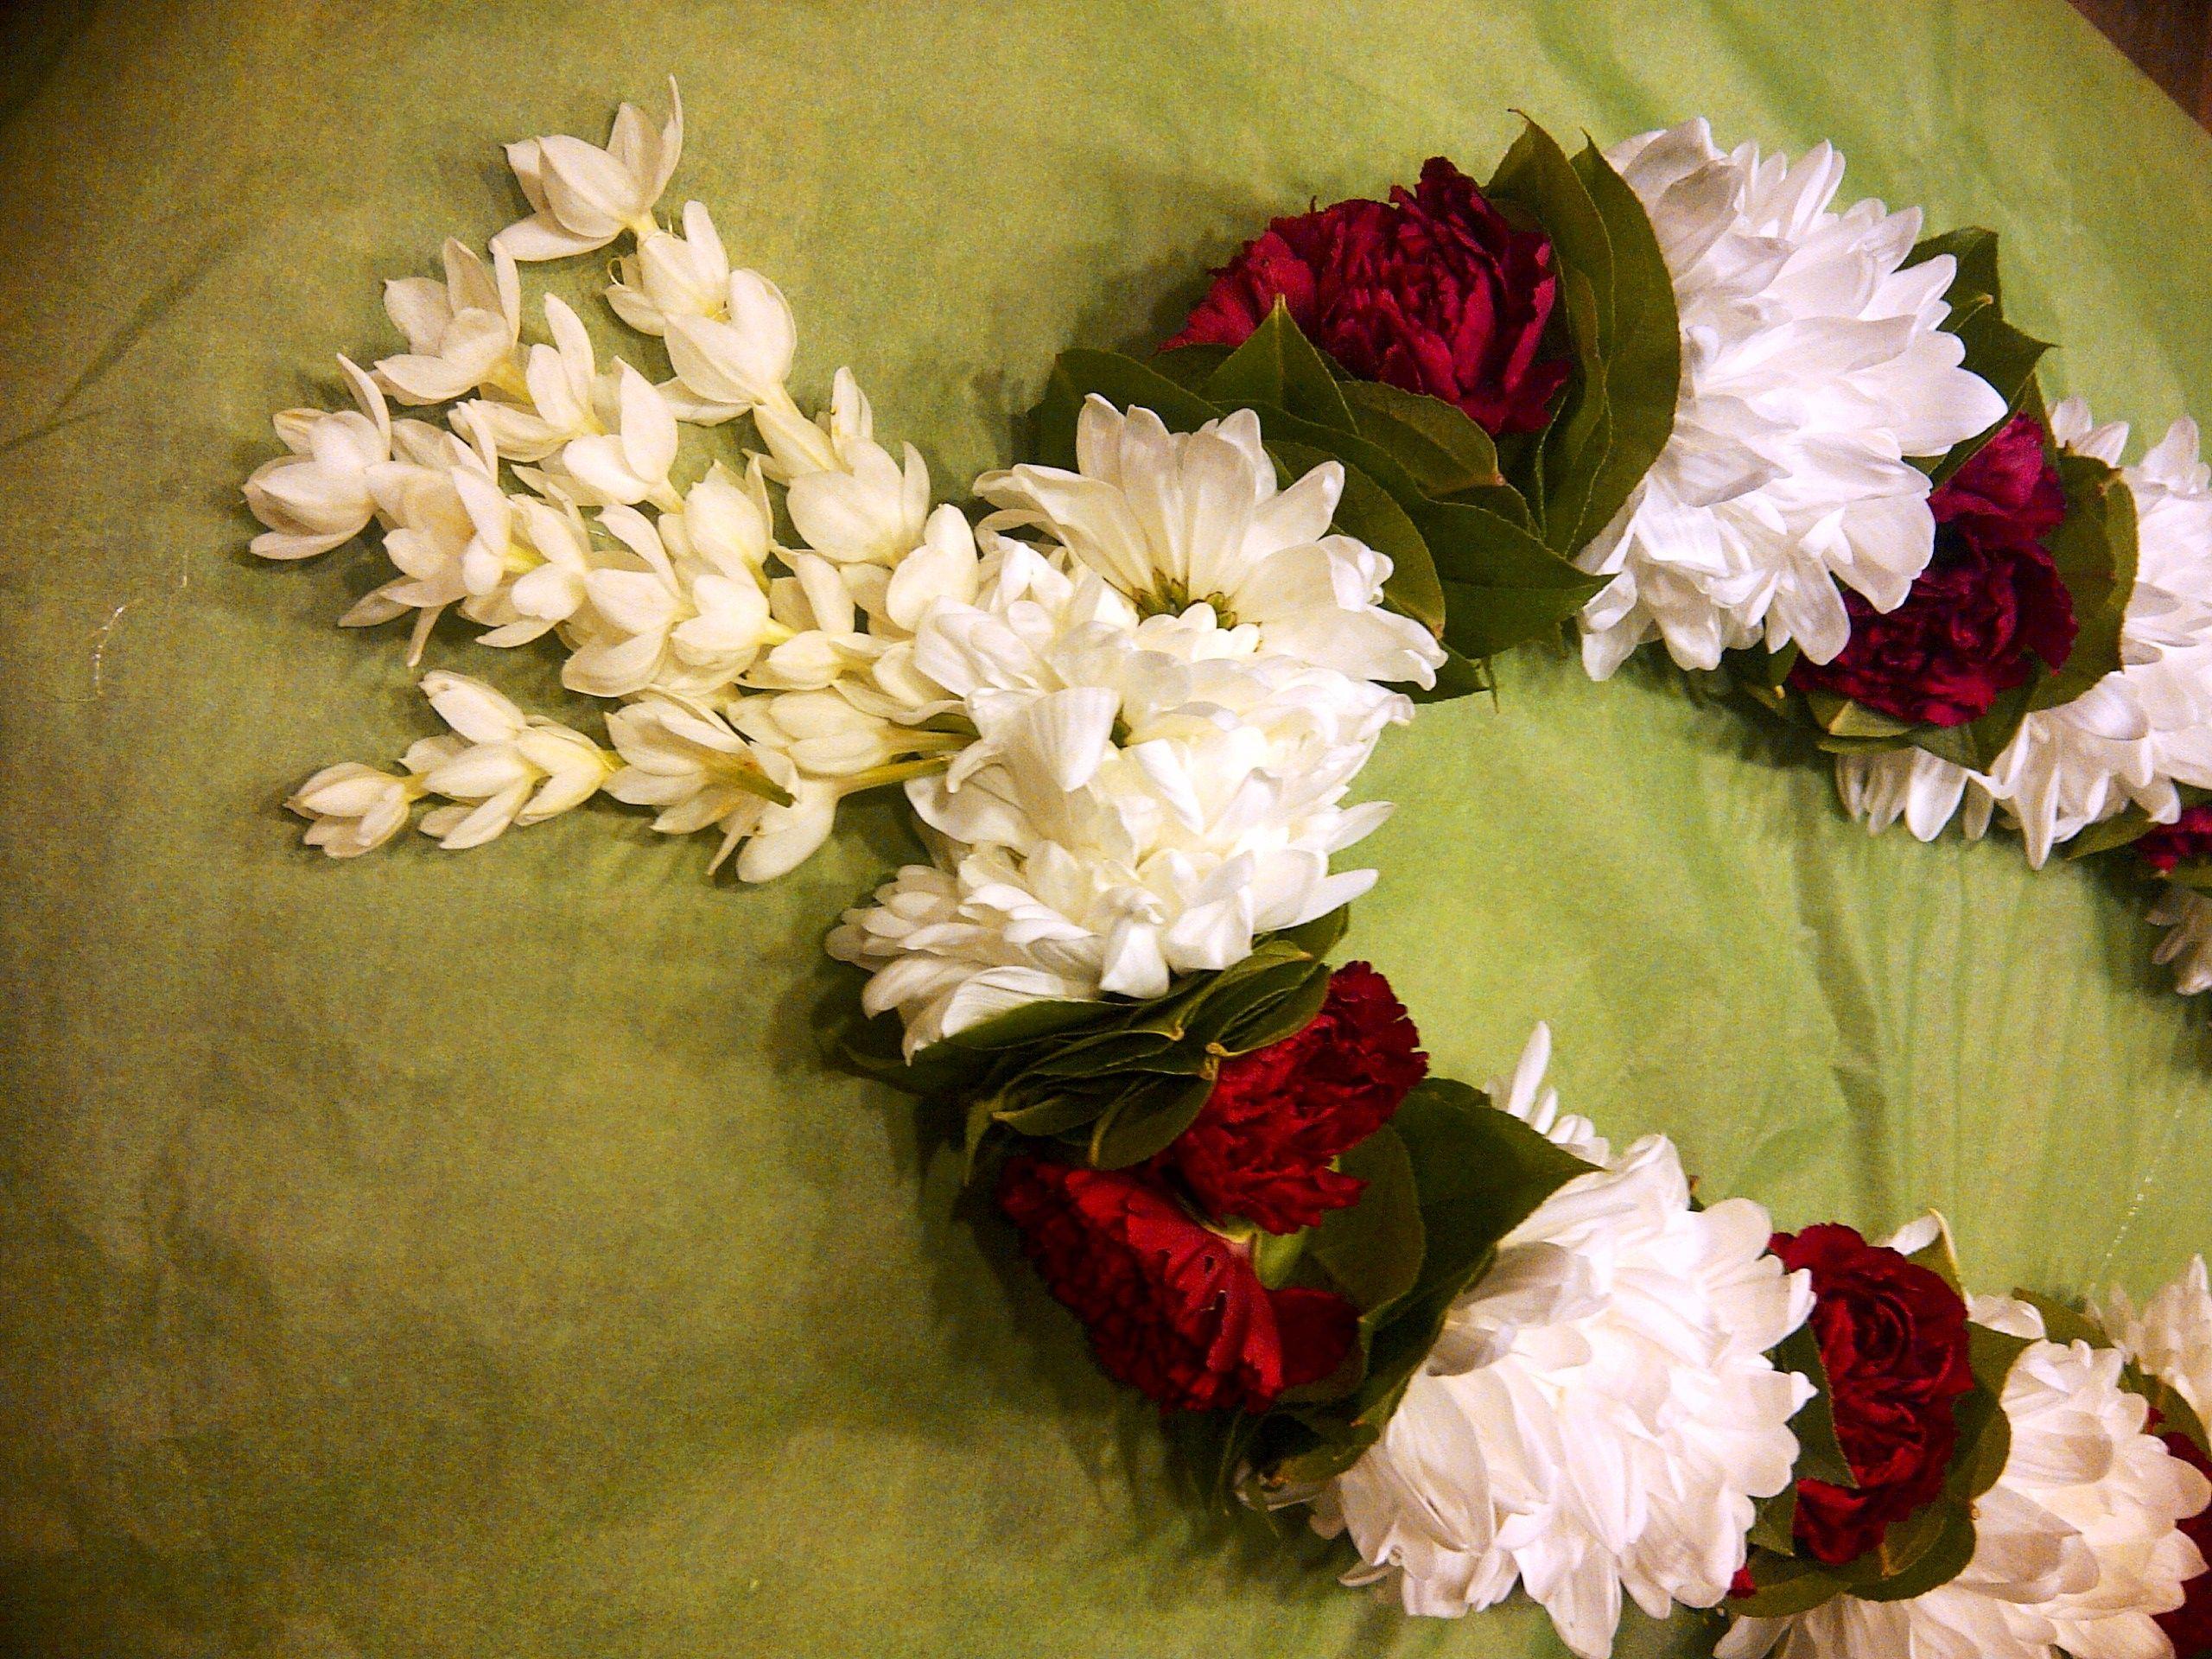 Cambodian Or Khmer Male Wedding Veil Flower Garland